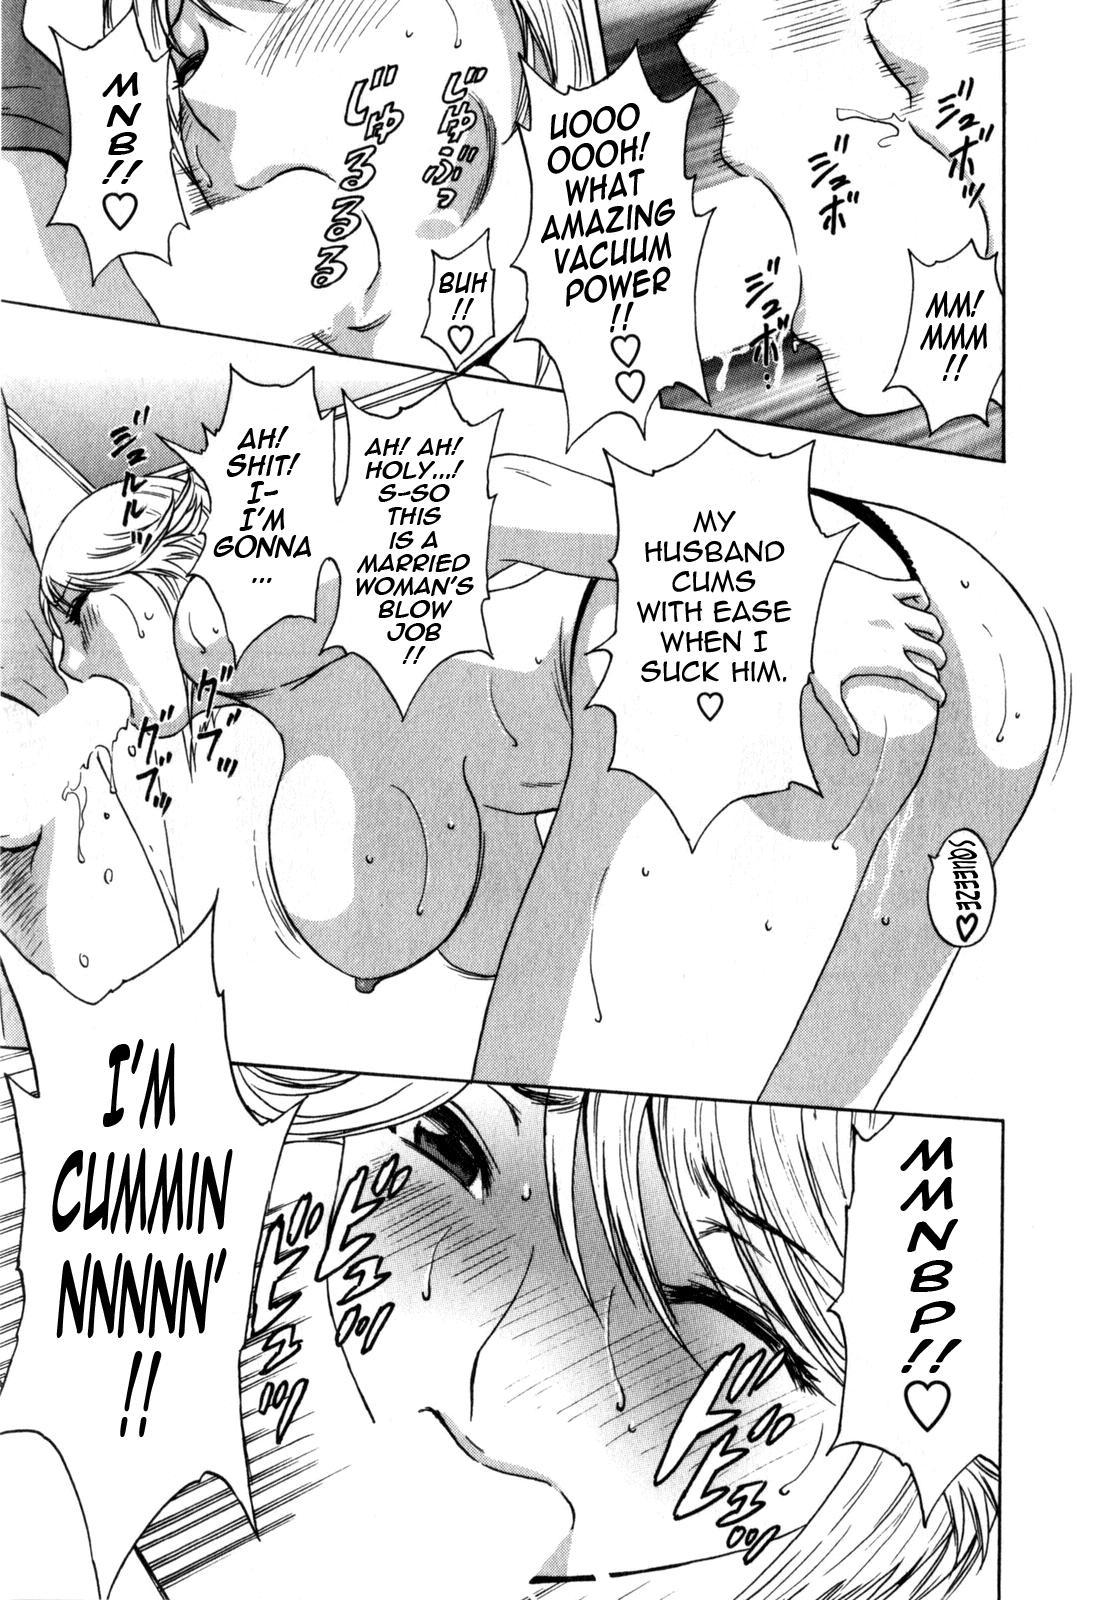 [Hidemaru] Life with Married Women Just Like a Manga 1 - Ch. 1-3 [English] {Tadanohito} 36